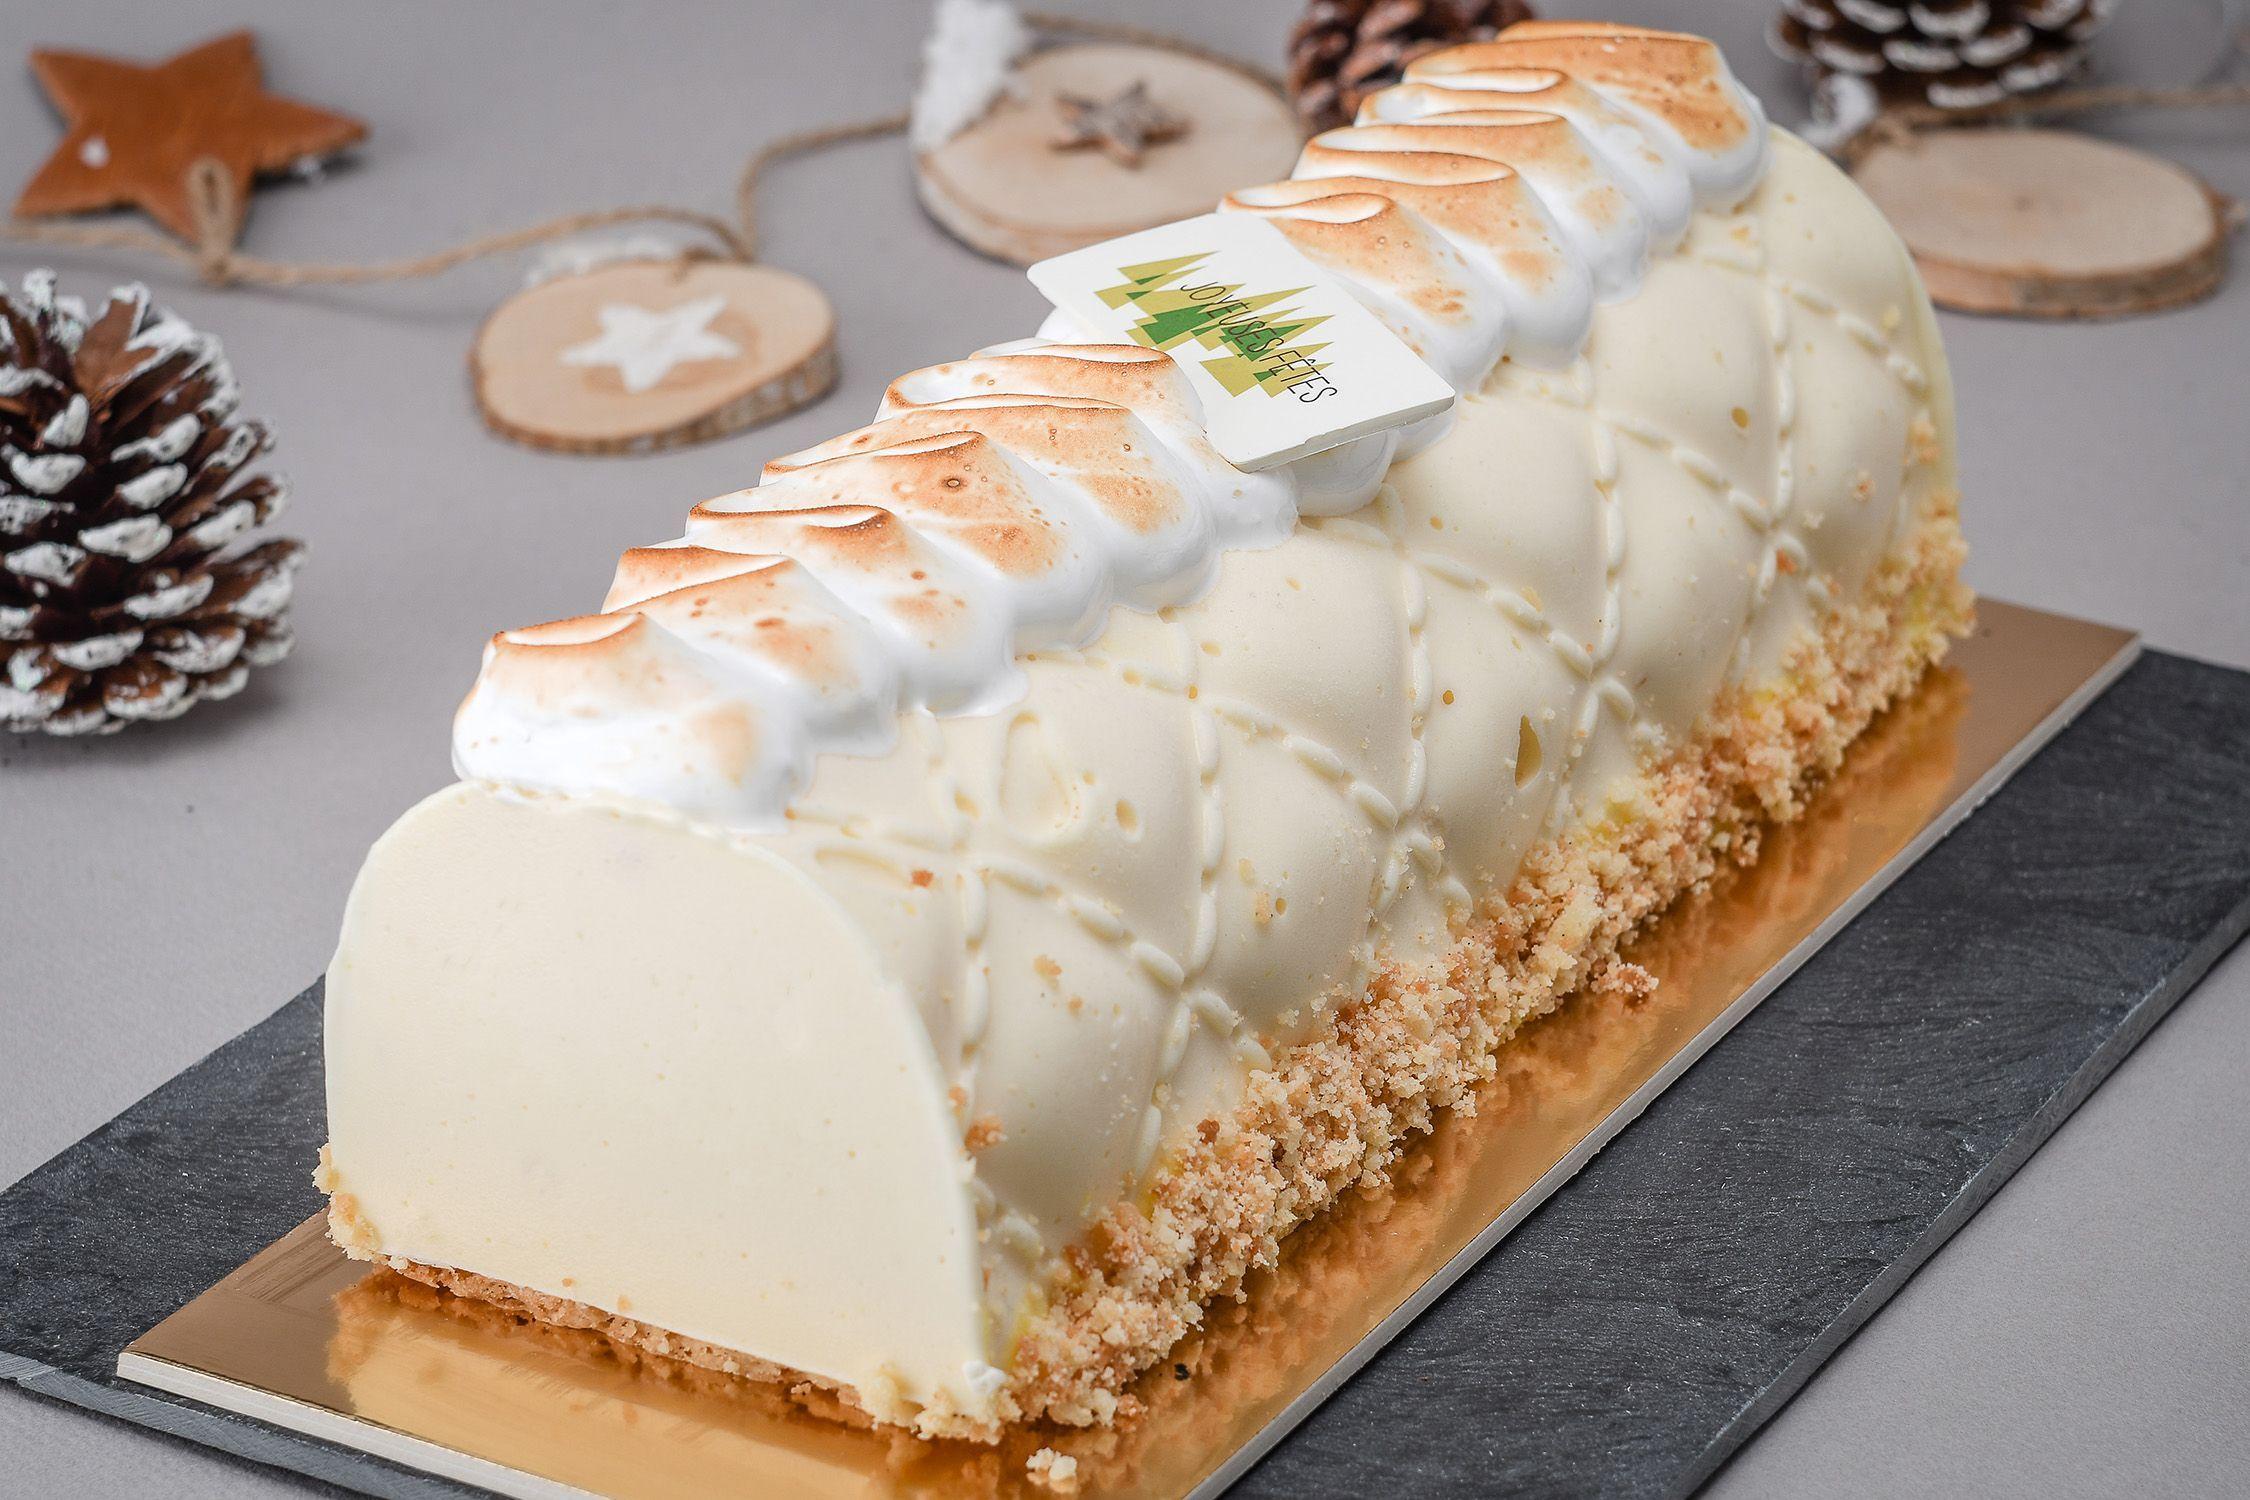 buche glacée tarte au citron